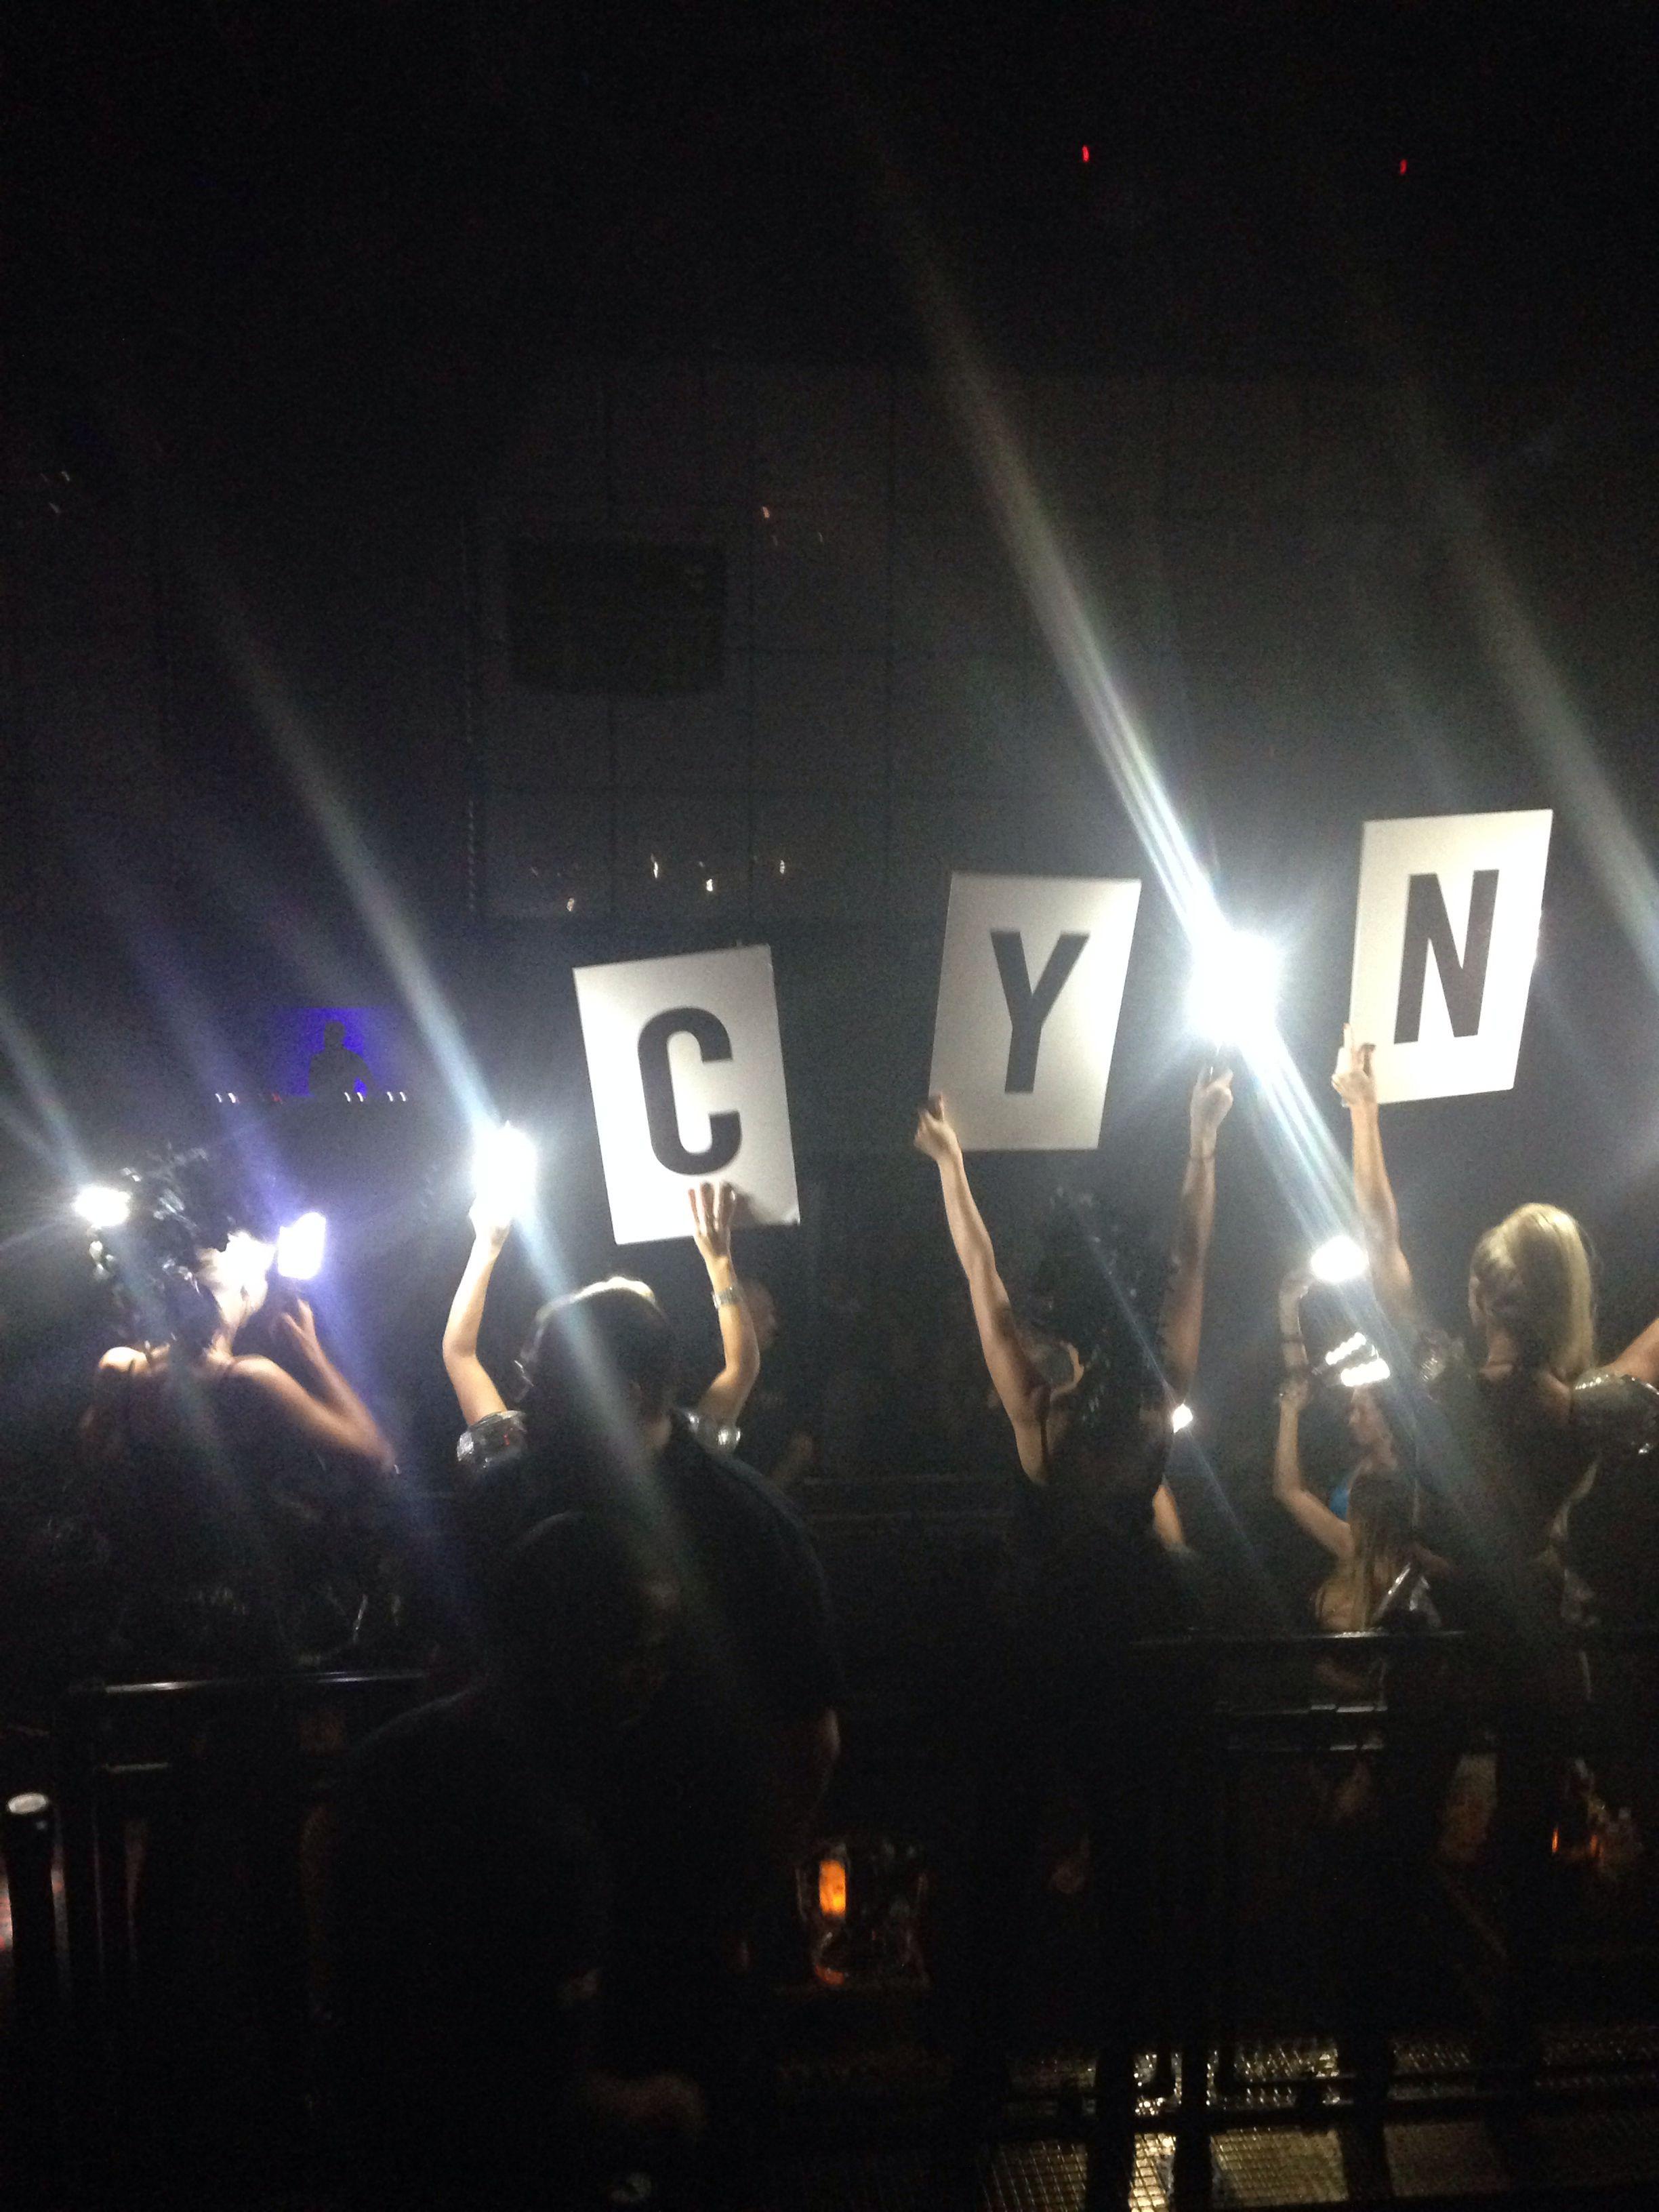 Nyc Or Cyn Las Vegas Concert Nyc